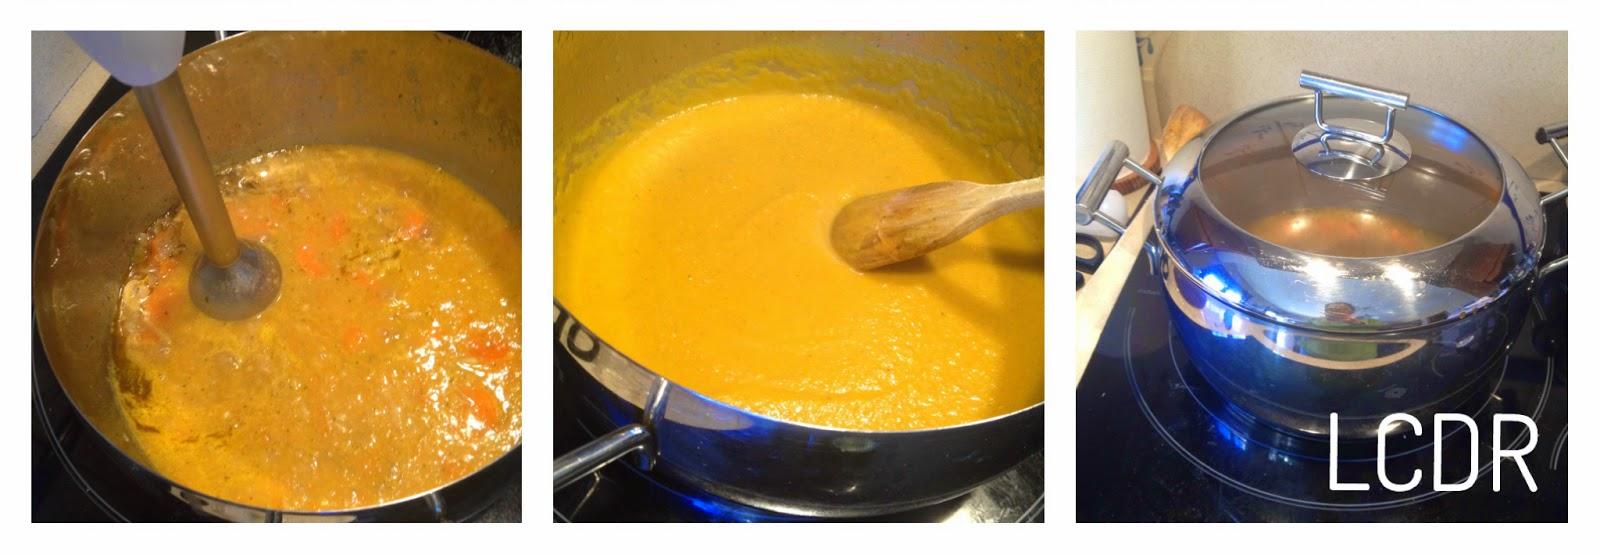 Receta de albóndigas de carne en salsa: salsa 03